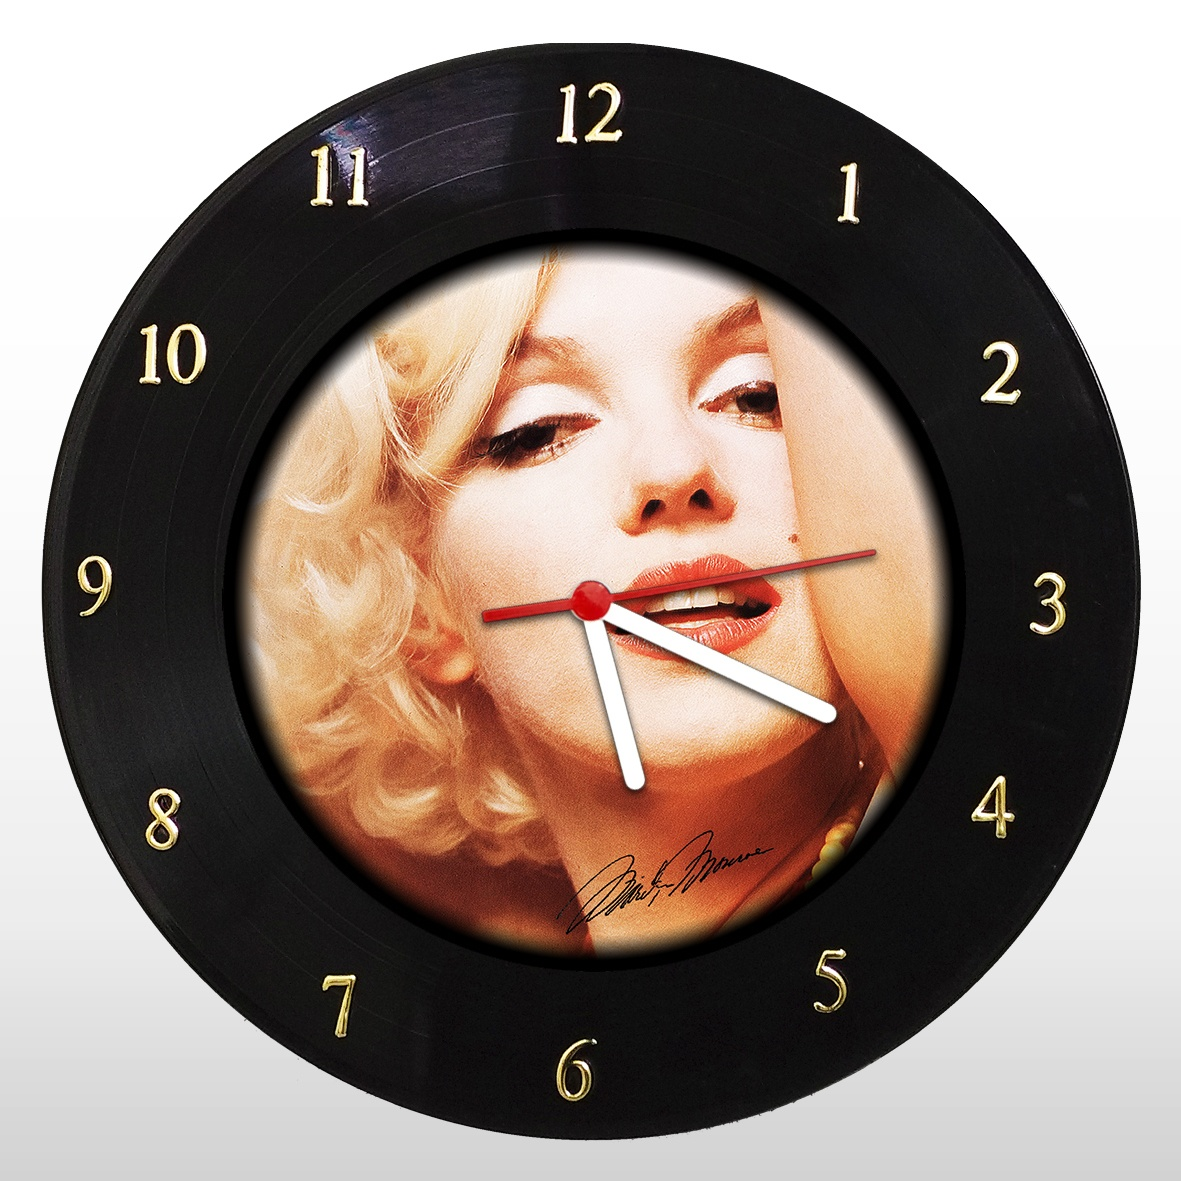 Marilyn Monroe - Relógio de Parede em Disco de Vinil - Mr. Rock